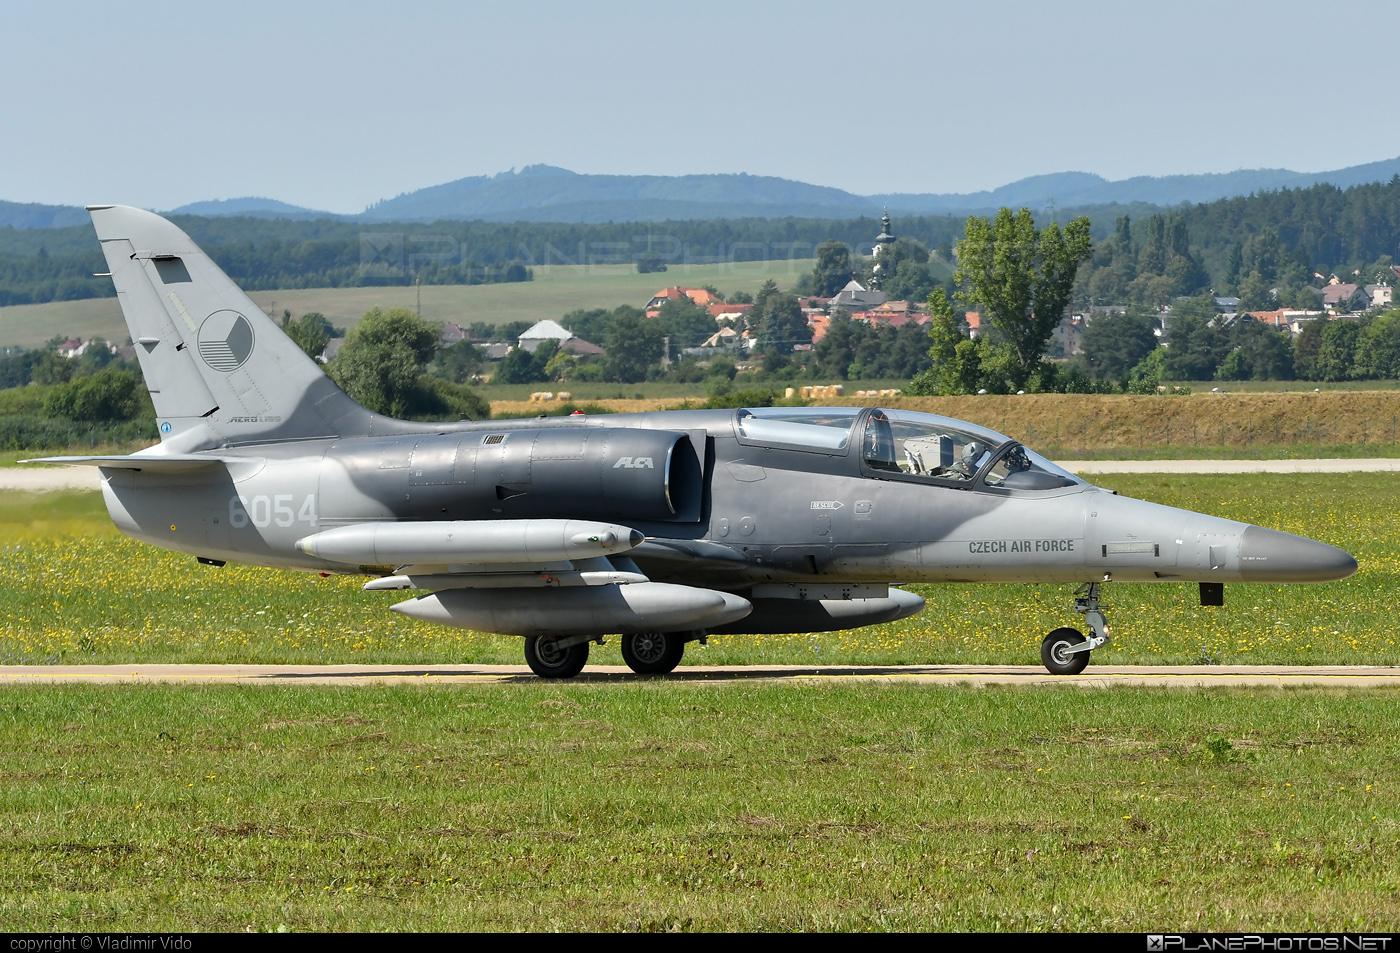 Aero L-159A Alca - 6054 operated by Vzdušné síly AČR (Czech Air Force) #aero #aerol159 #aerol159aalca #aerol159alca #czechairforce #l159 #l159a #l159aalca #l159alca #siaf2019 #vzdusnesilyacr